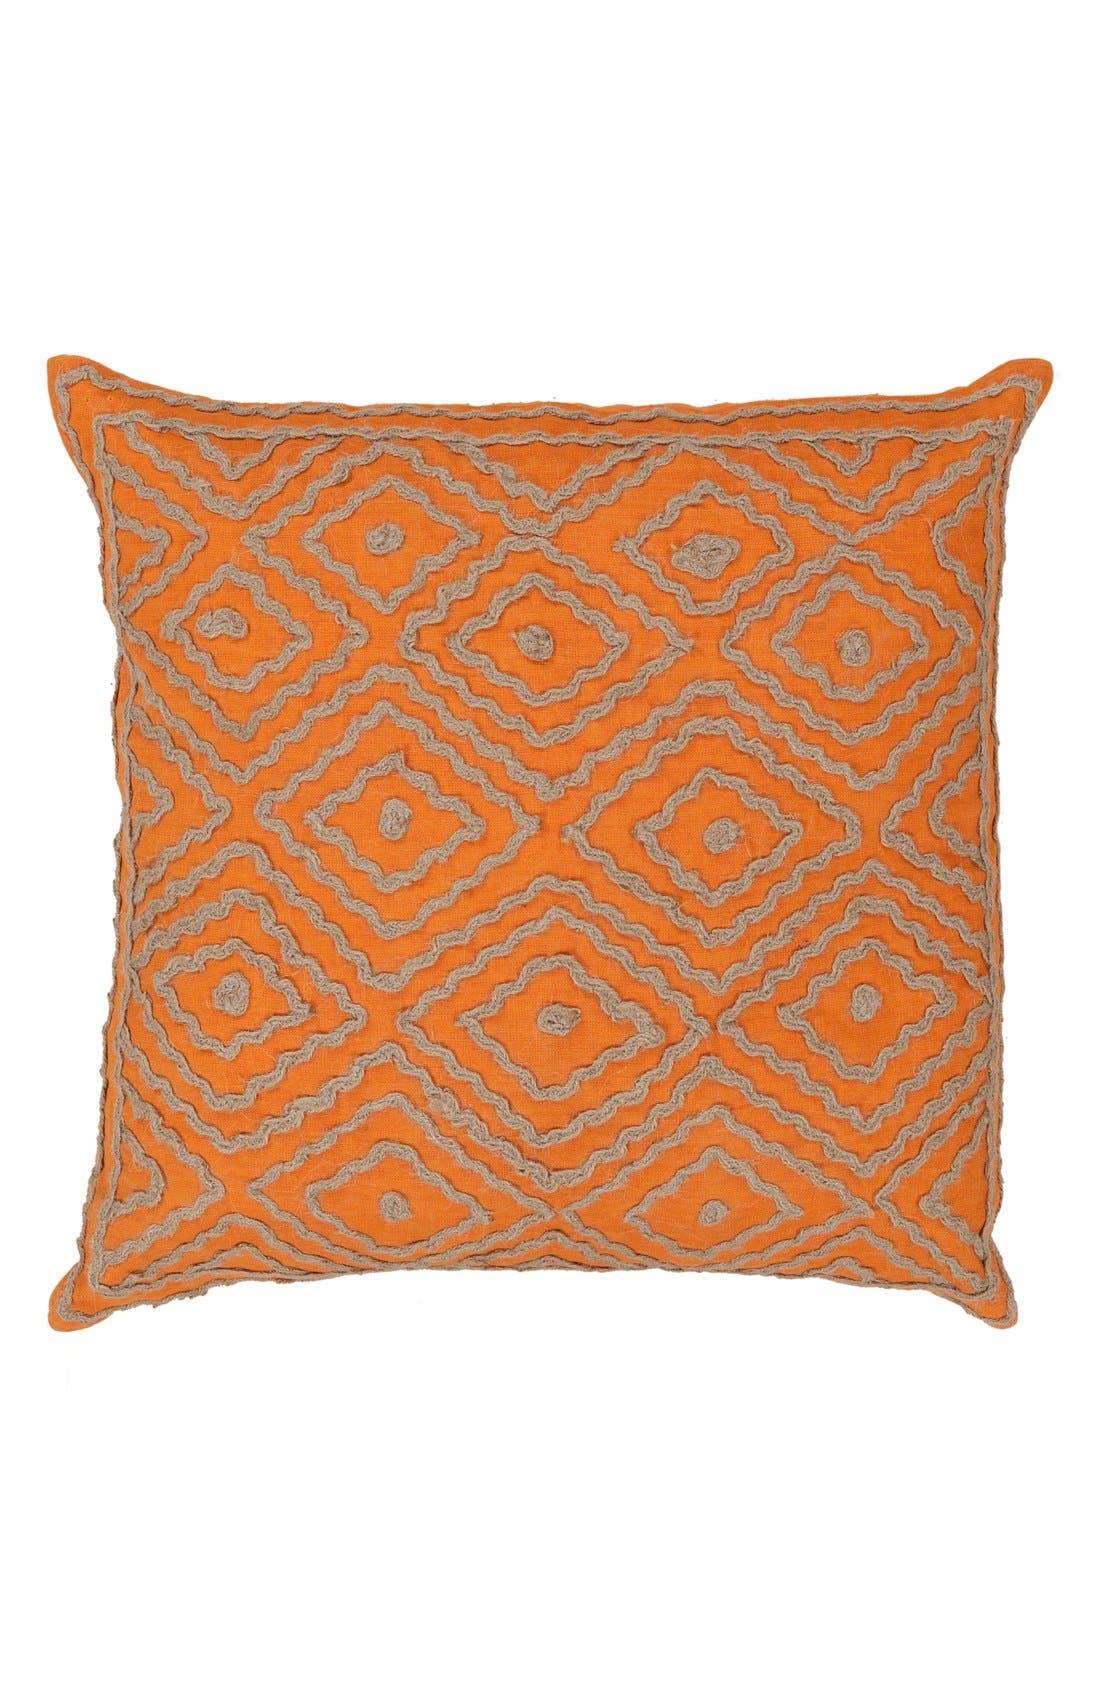 'Atlas' Pillow,                         Main,                         color, Burnt Orange/ Taupe